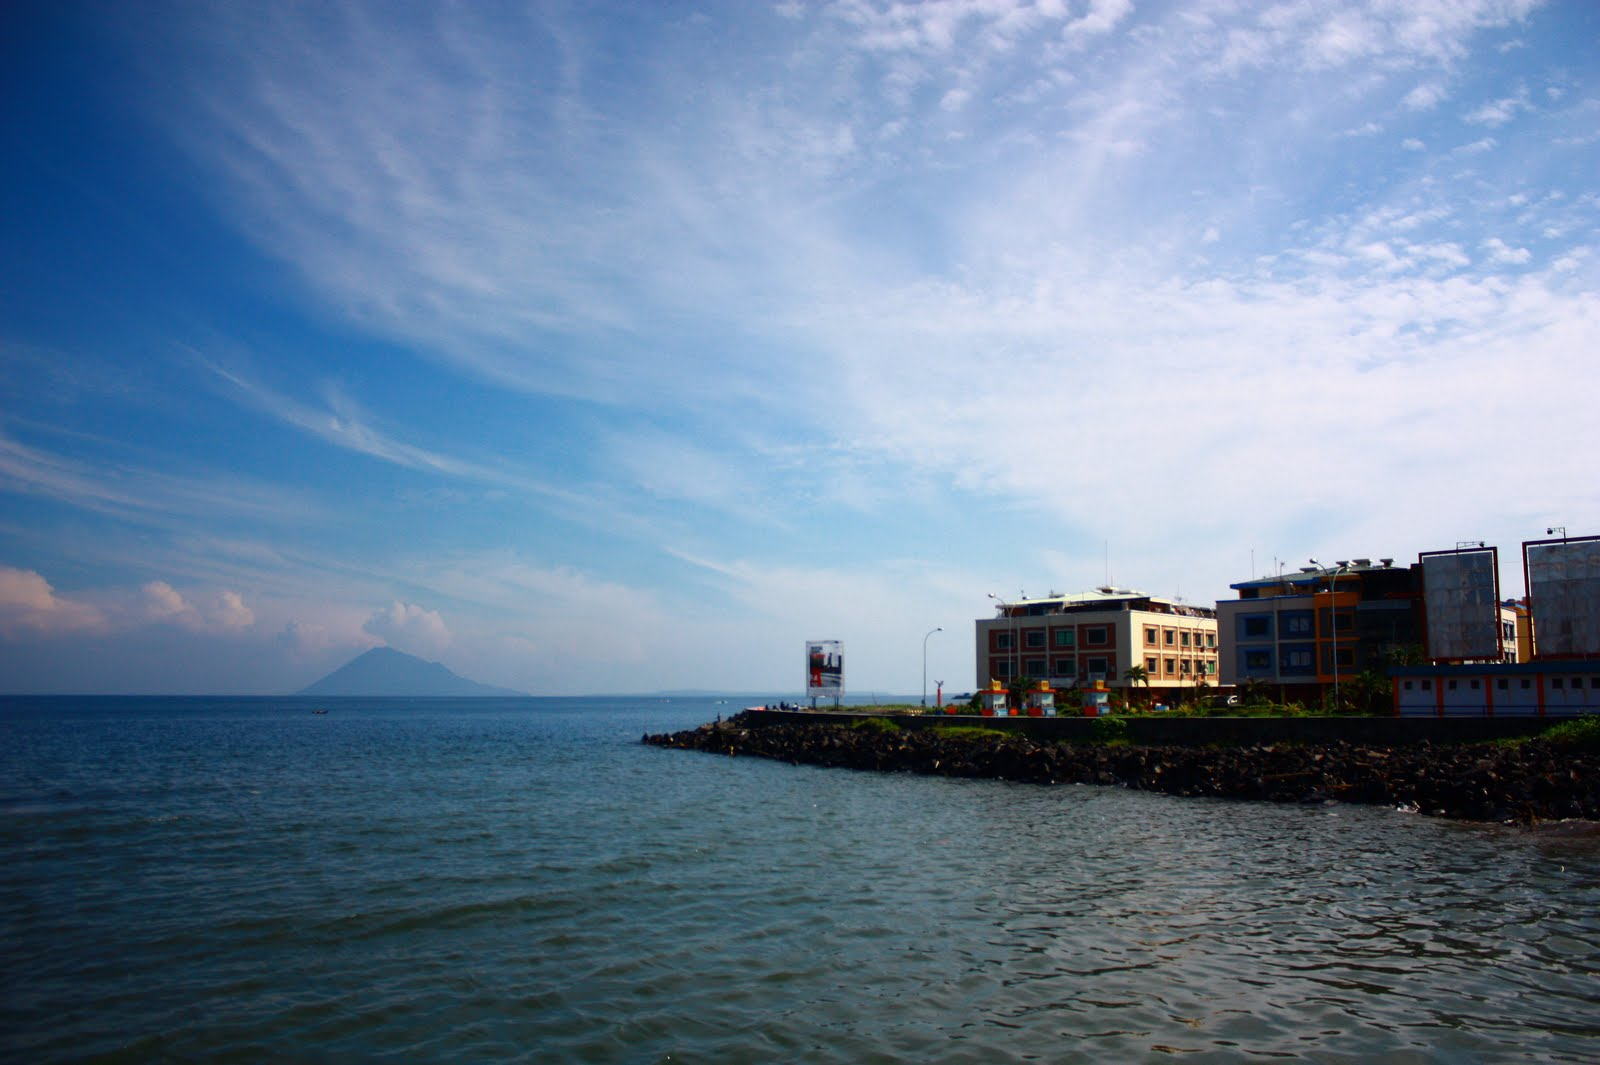 Wisata Kawasan Boulevard Indah Kuliner Khas Manado Kota